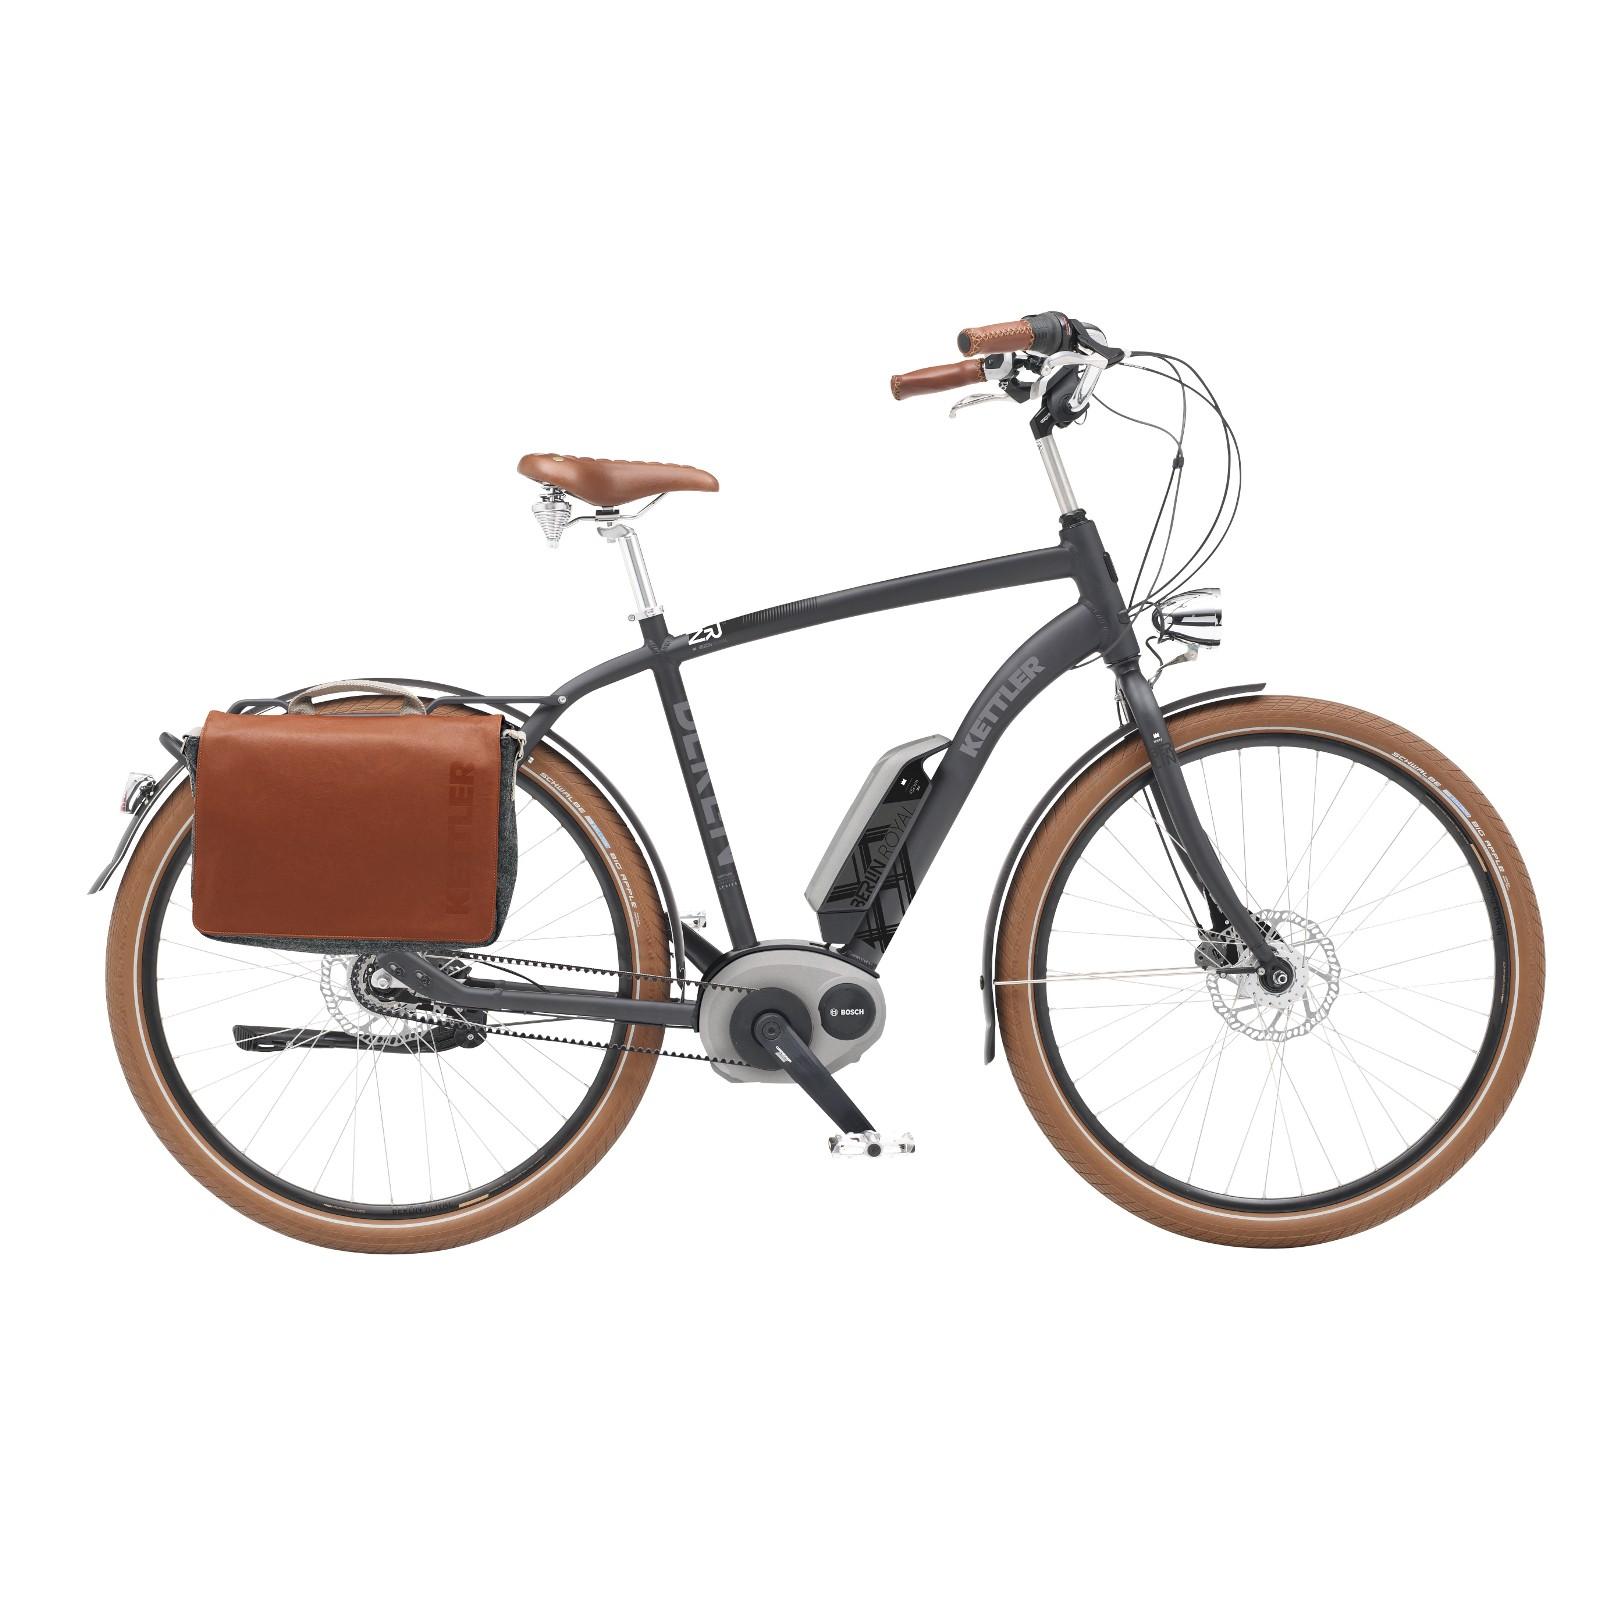 kettler e bike berlin royal e diamond 28 inch best buy. Black Bedroom Furniture Sets. Home Design Ideas